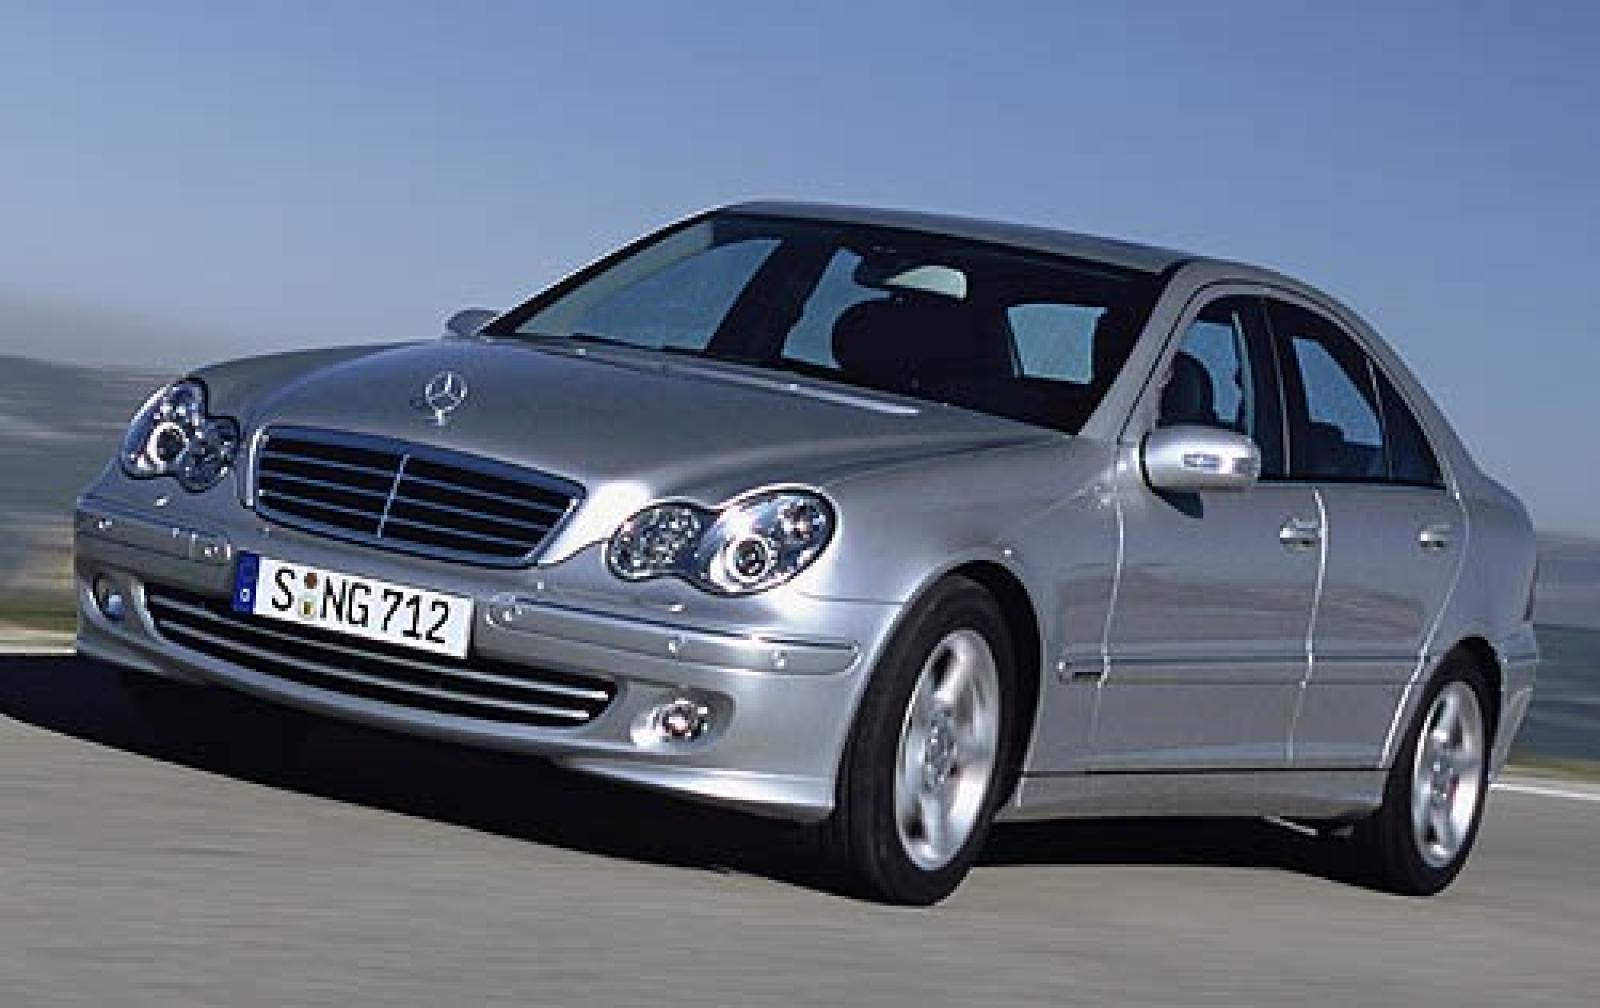 2006 Mercedes Benz C Class #1 800 1024 1280 1600 Origin